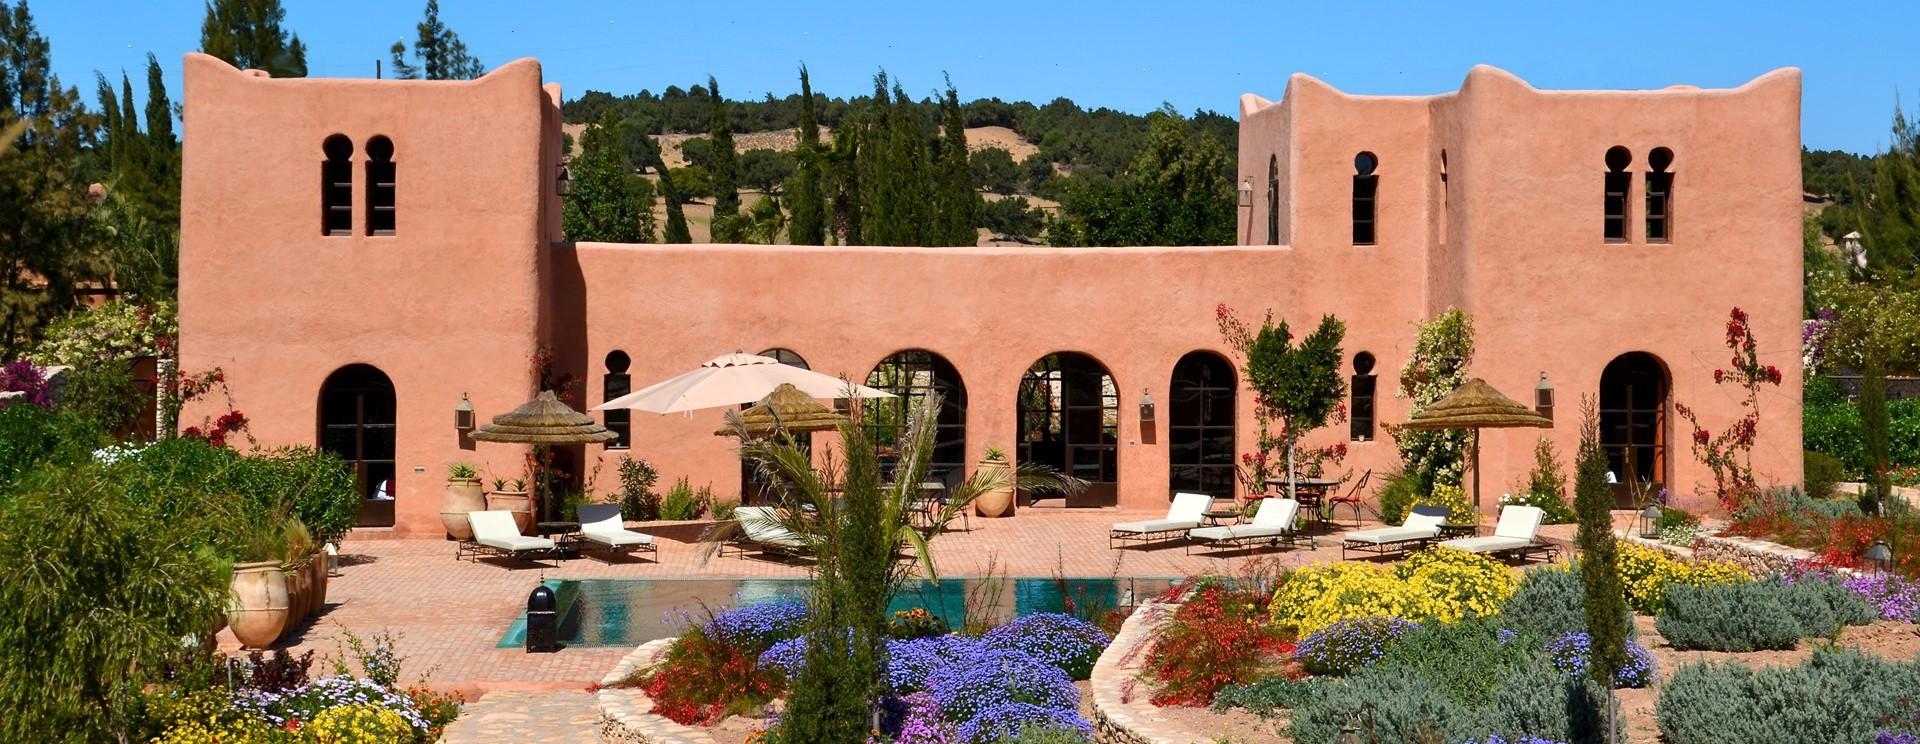 4-bedroom-villa-jardin-des-douars